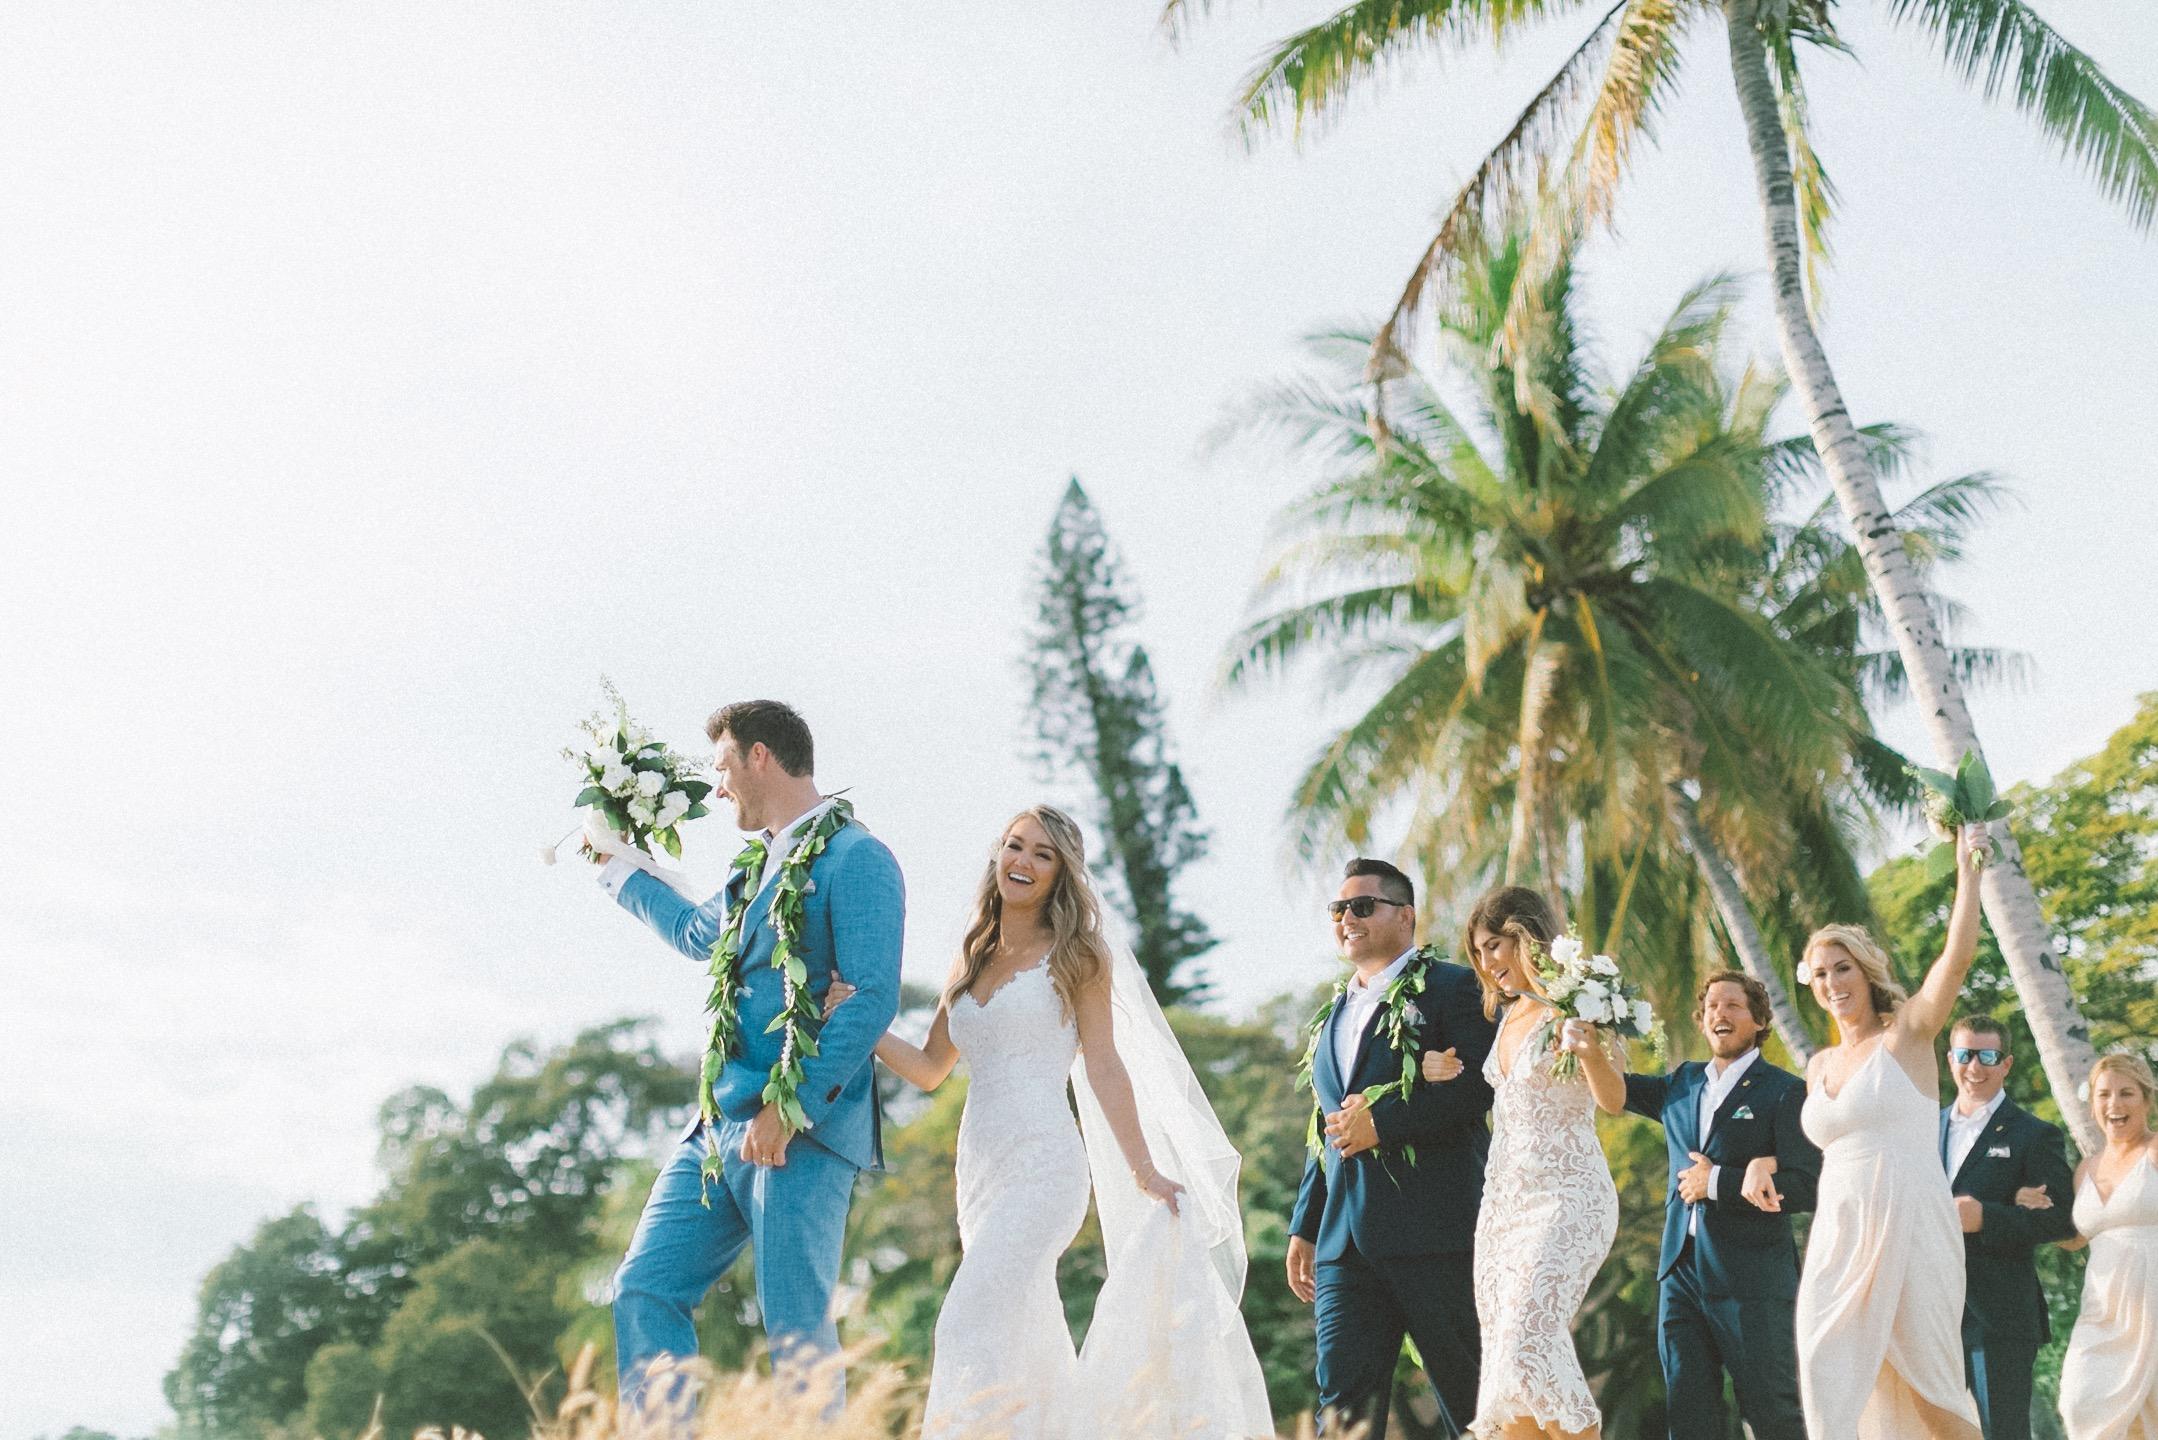 wedding party mauid.jpg